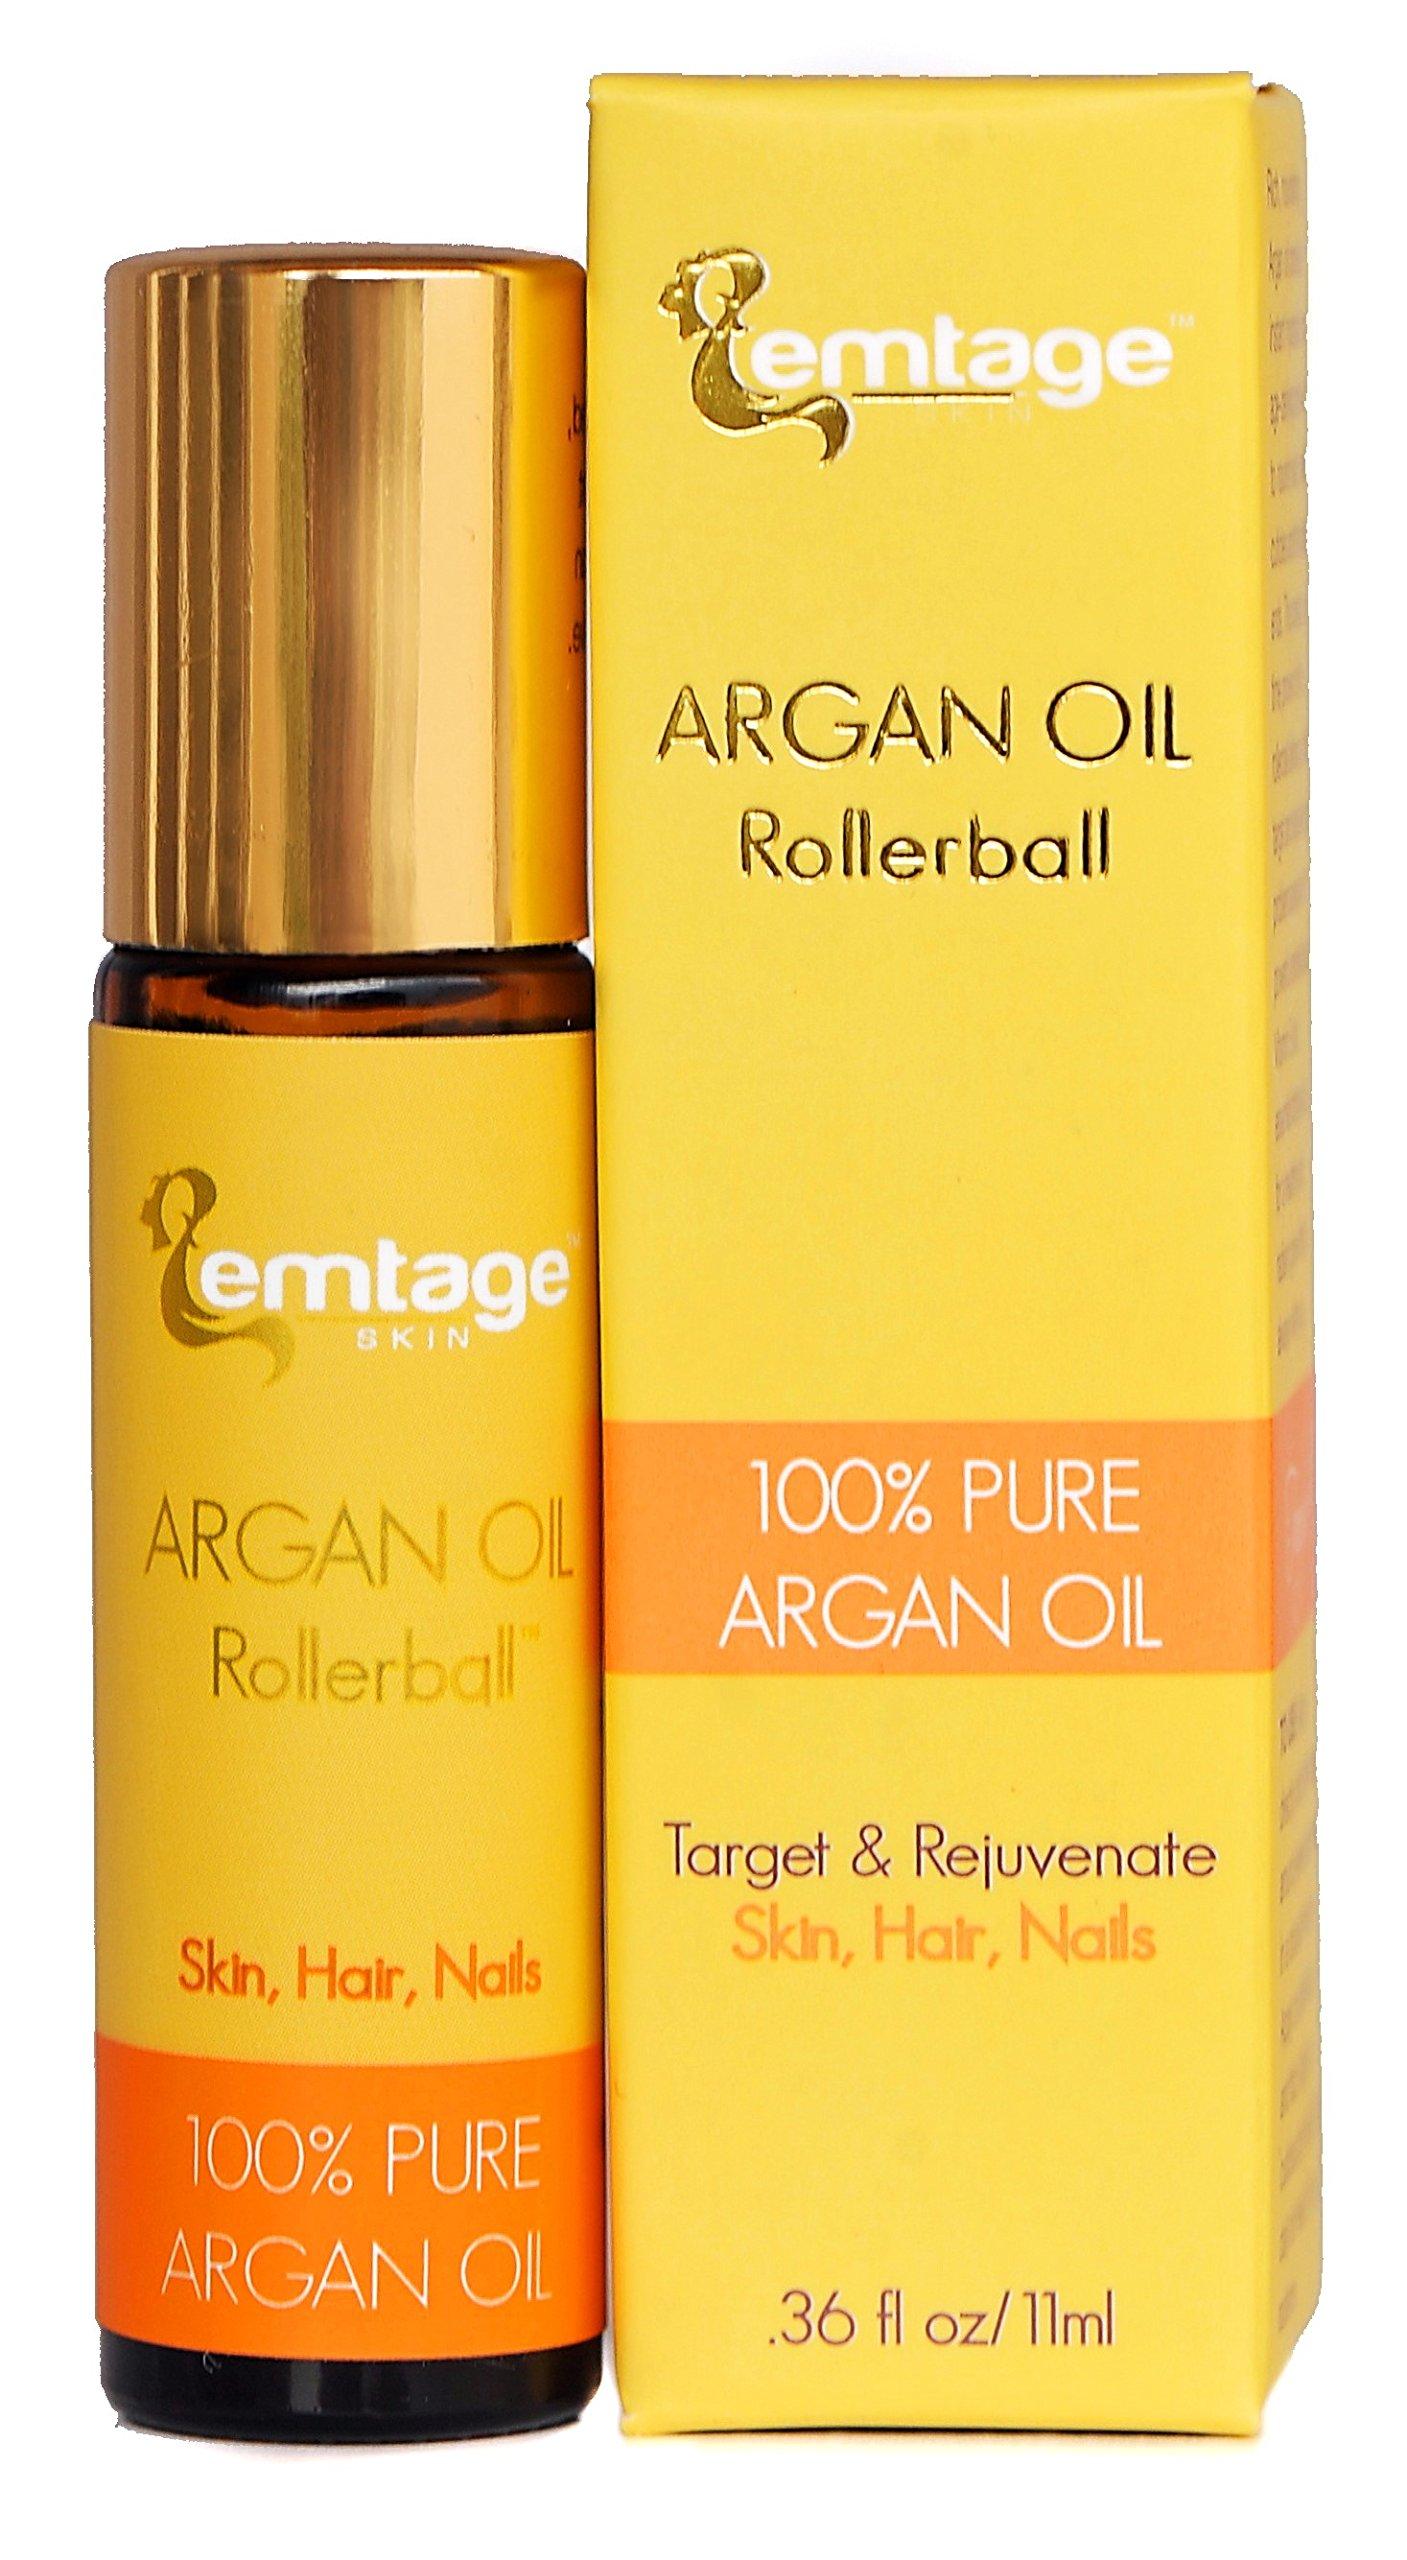 Argan Oil Rollerball - 100% Pure, Organic, Cold Pressed Moroccan Argan Oil in a Roll-on. Argan Oil Treatment for Hair, Skin, Nails .33 fl oz. Anti-Aging.